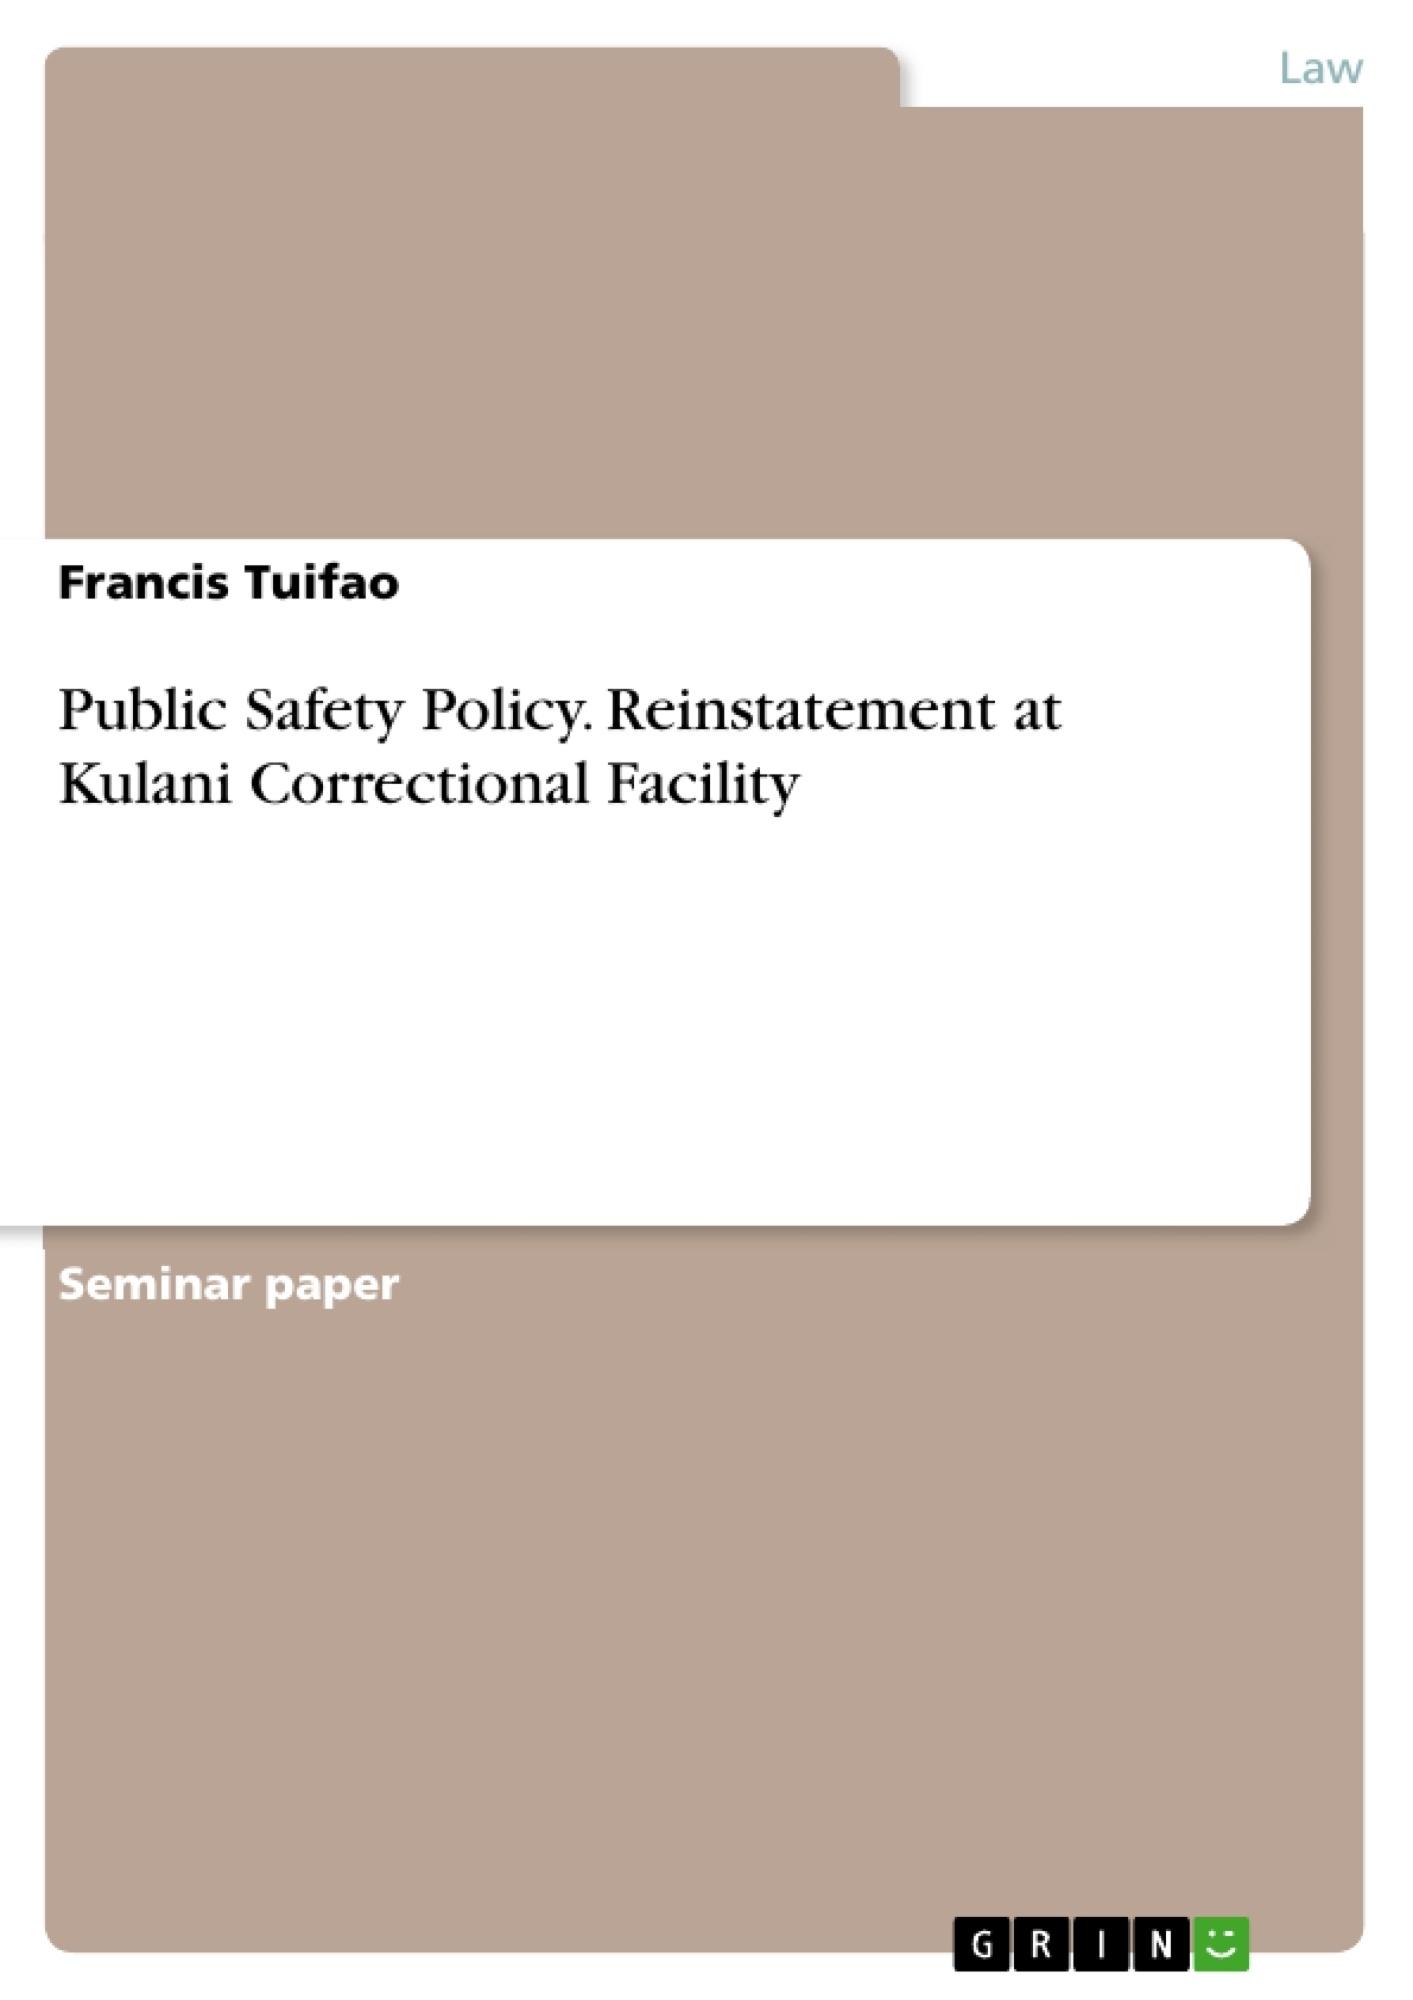 Title: Public Safety Policy. Reinstatement at Kulani Correctional Facility